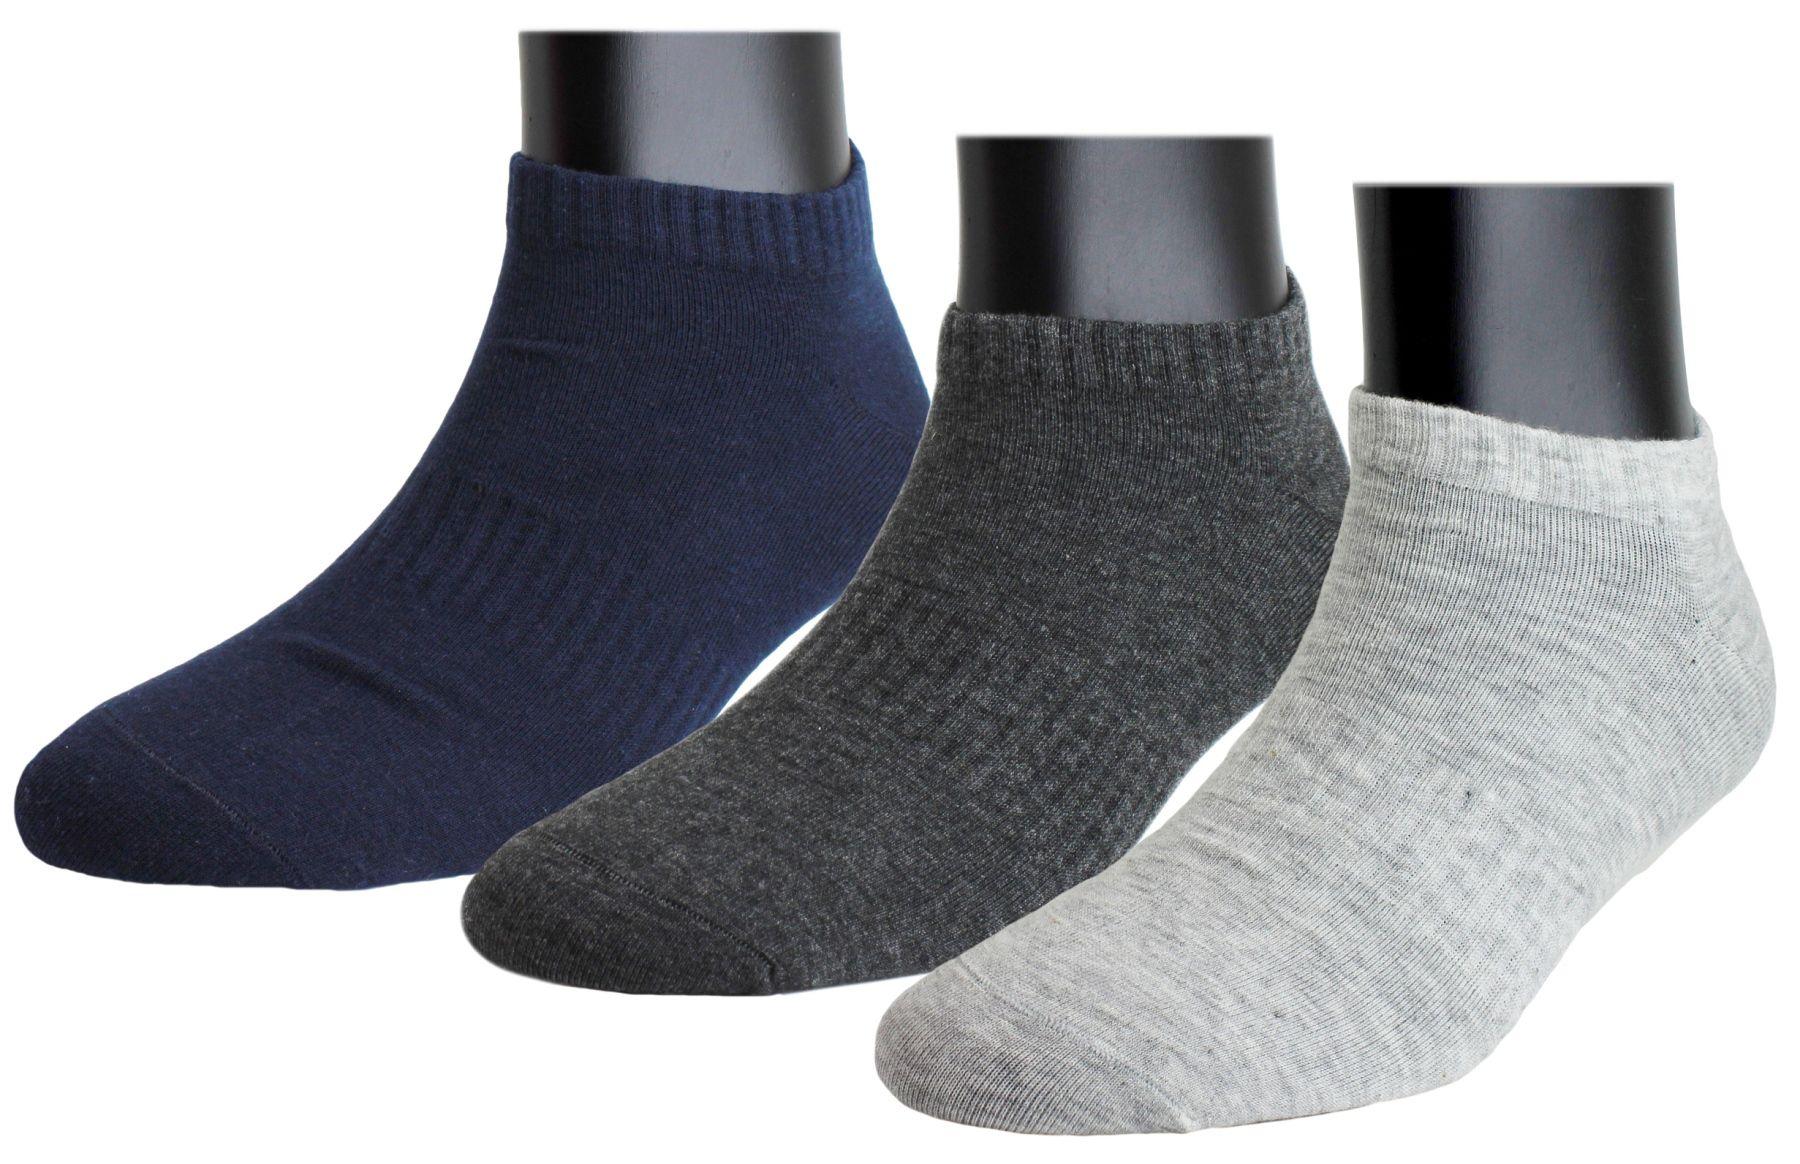 Neska Moda Premium Men  amp; Women 3 Pairs Cotton Ankle Length Socks Dark Blue,Grey